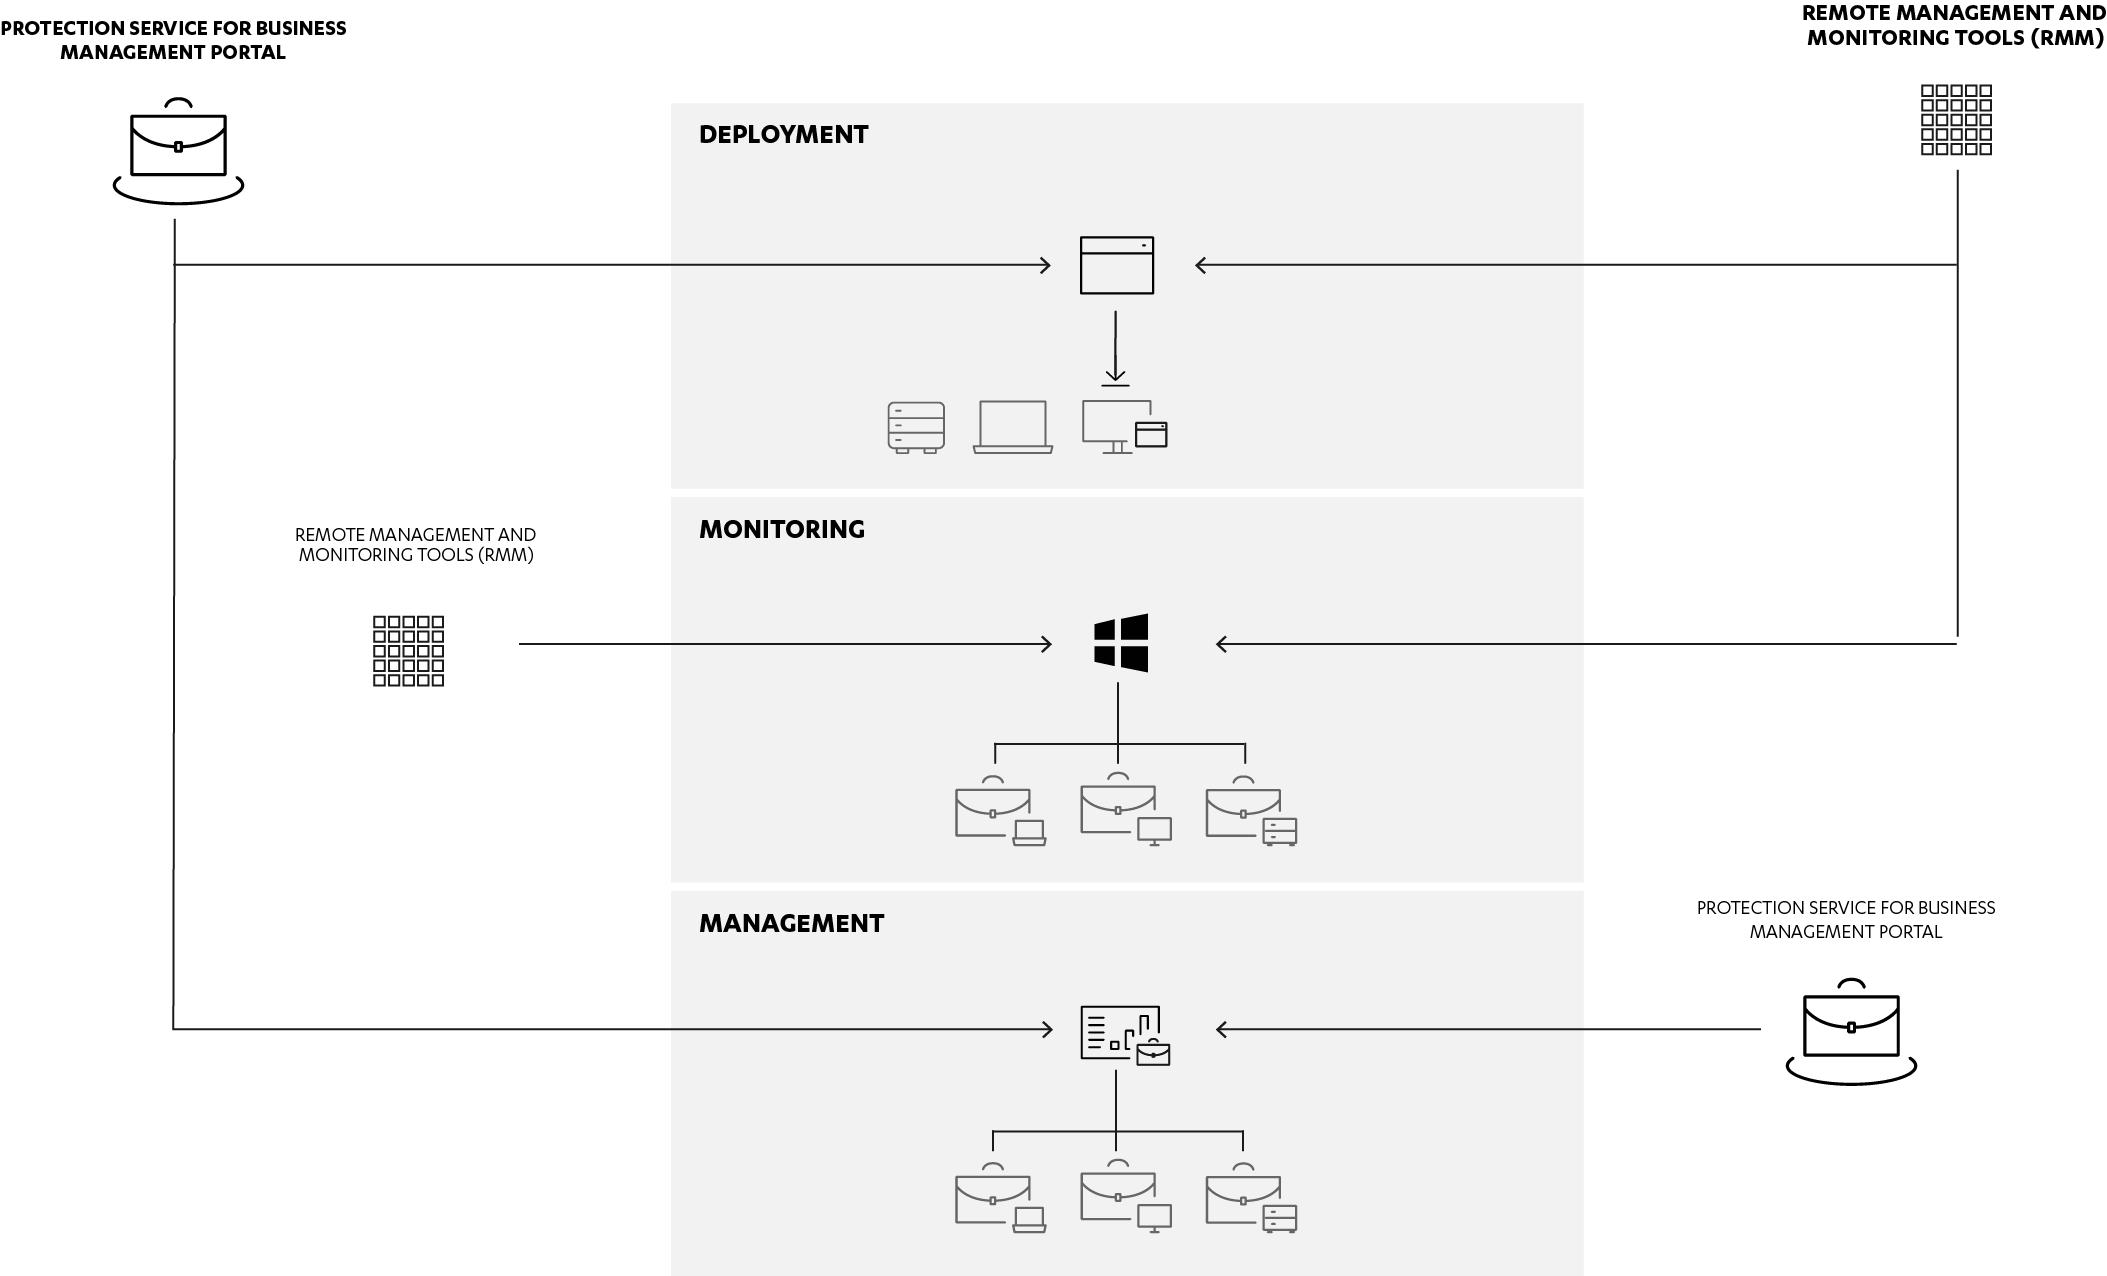 Using third-party RMM tools | Management Portal | Latest | F